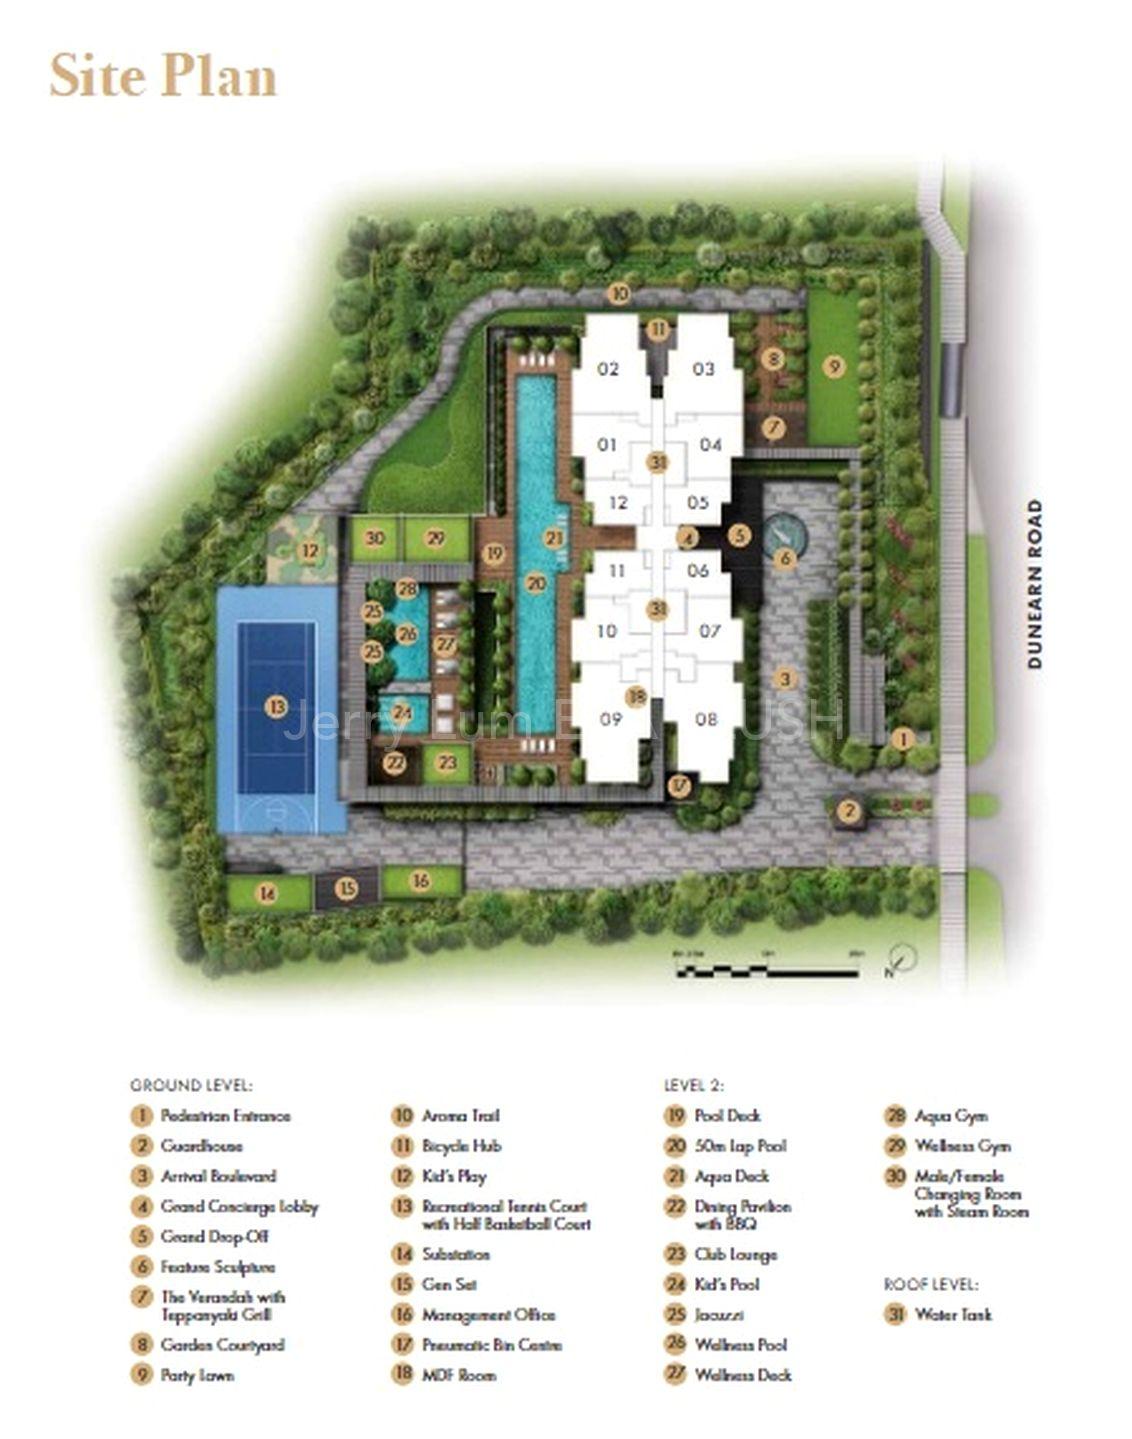 Site Plan + Amenities